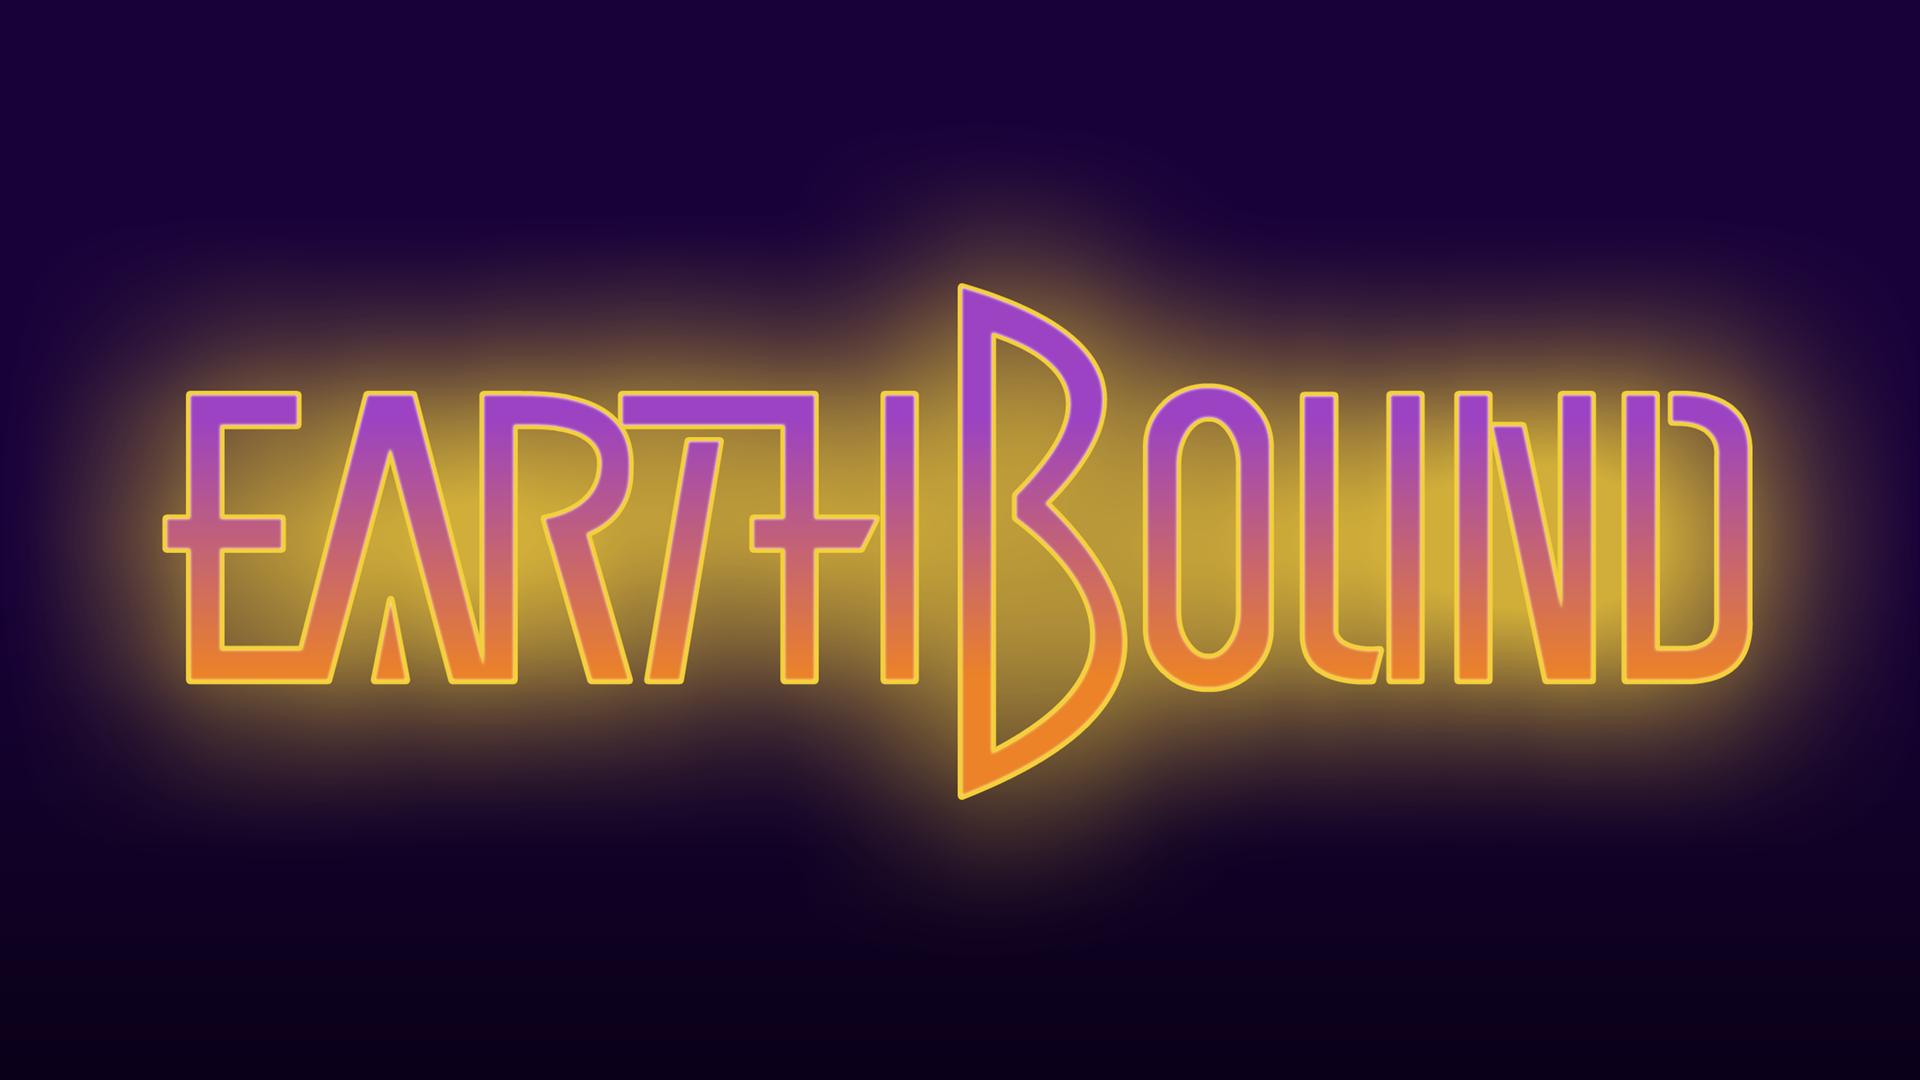 Earthbound Logo Wallpaper 1920x1080 by hocotate civ 1920x1080